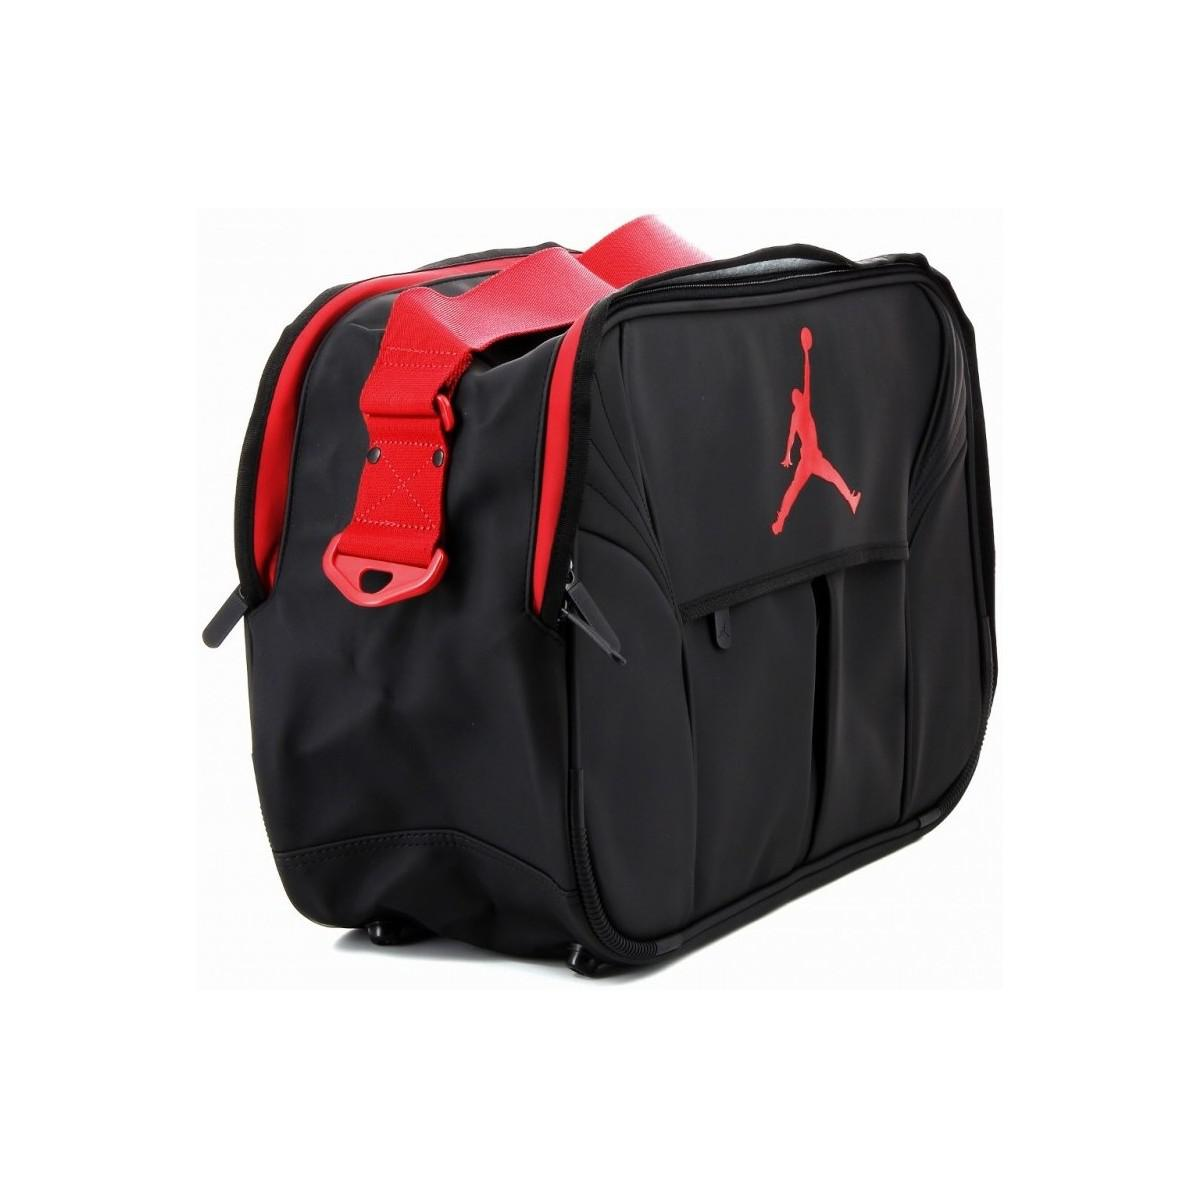 415064a646 Sac de sport Jordan All Weather - 576585-010 hommes Sac de sport en ...